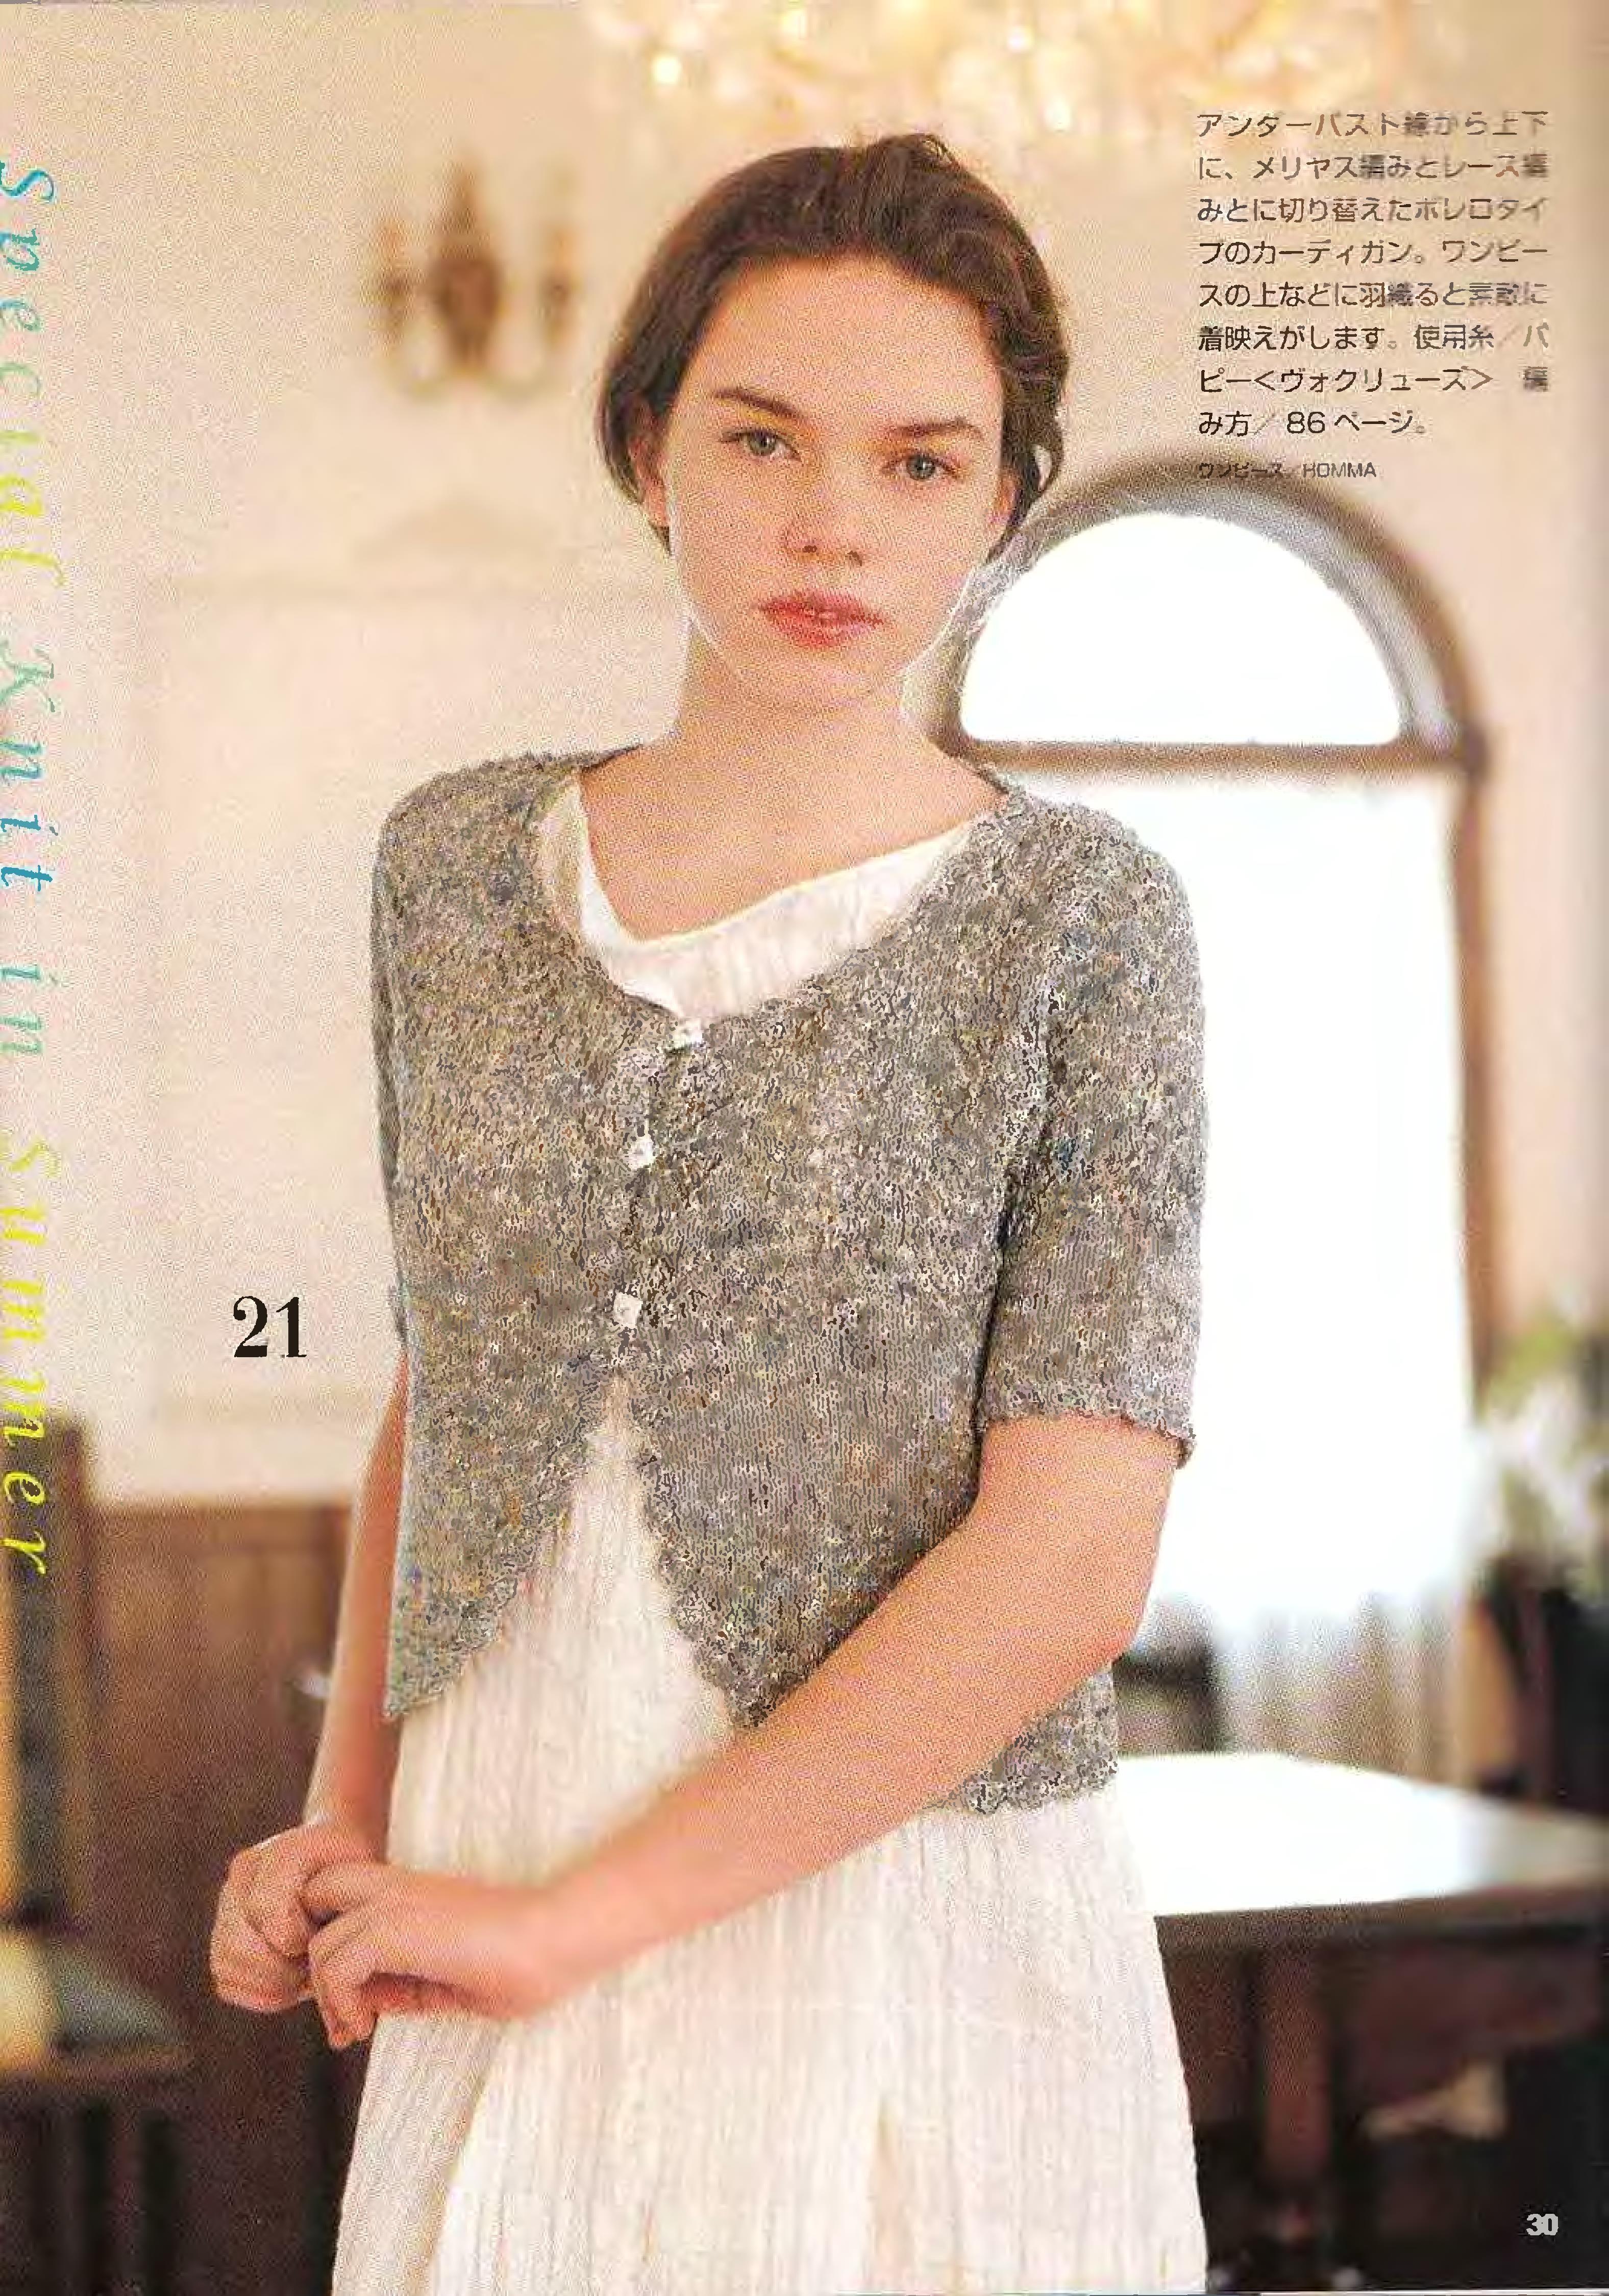 Lets-knit-series-NV4359-2008-Spring-Summer-sp-kr_28.jpg